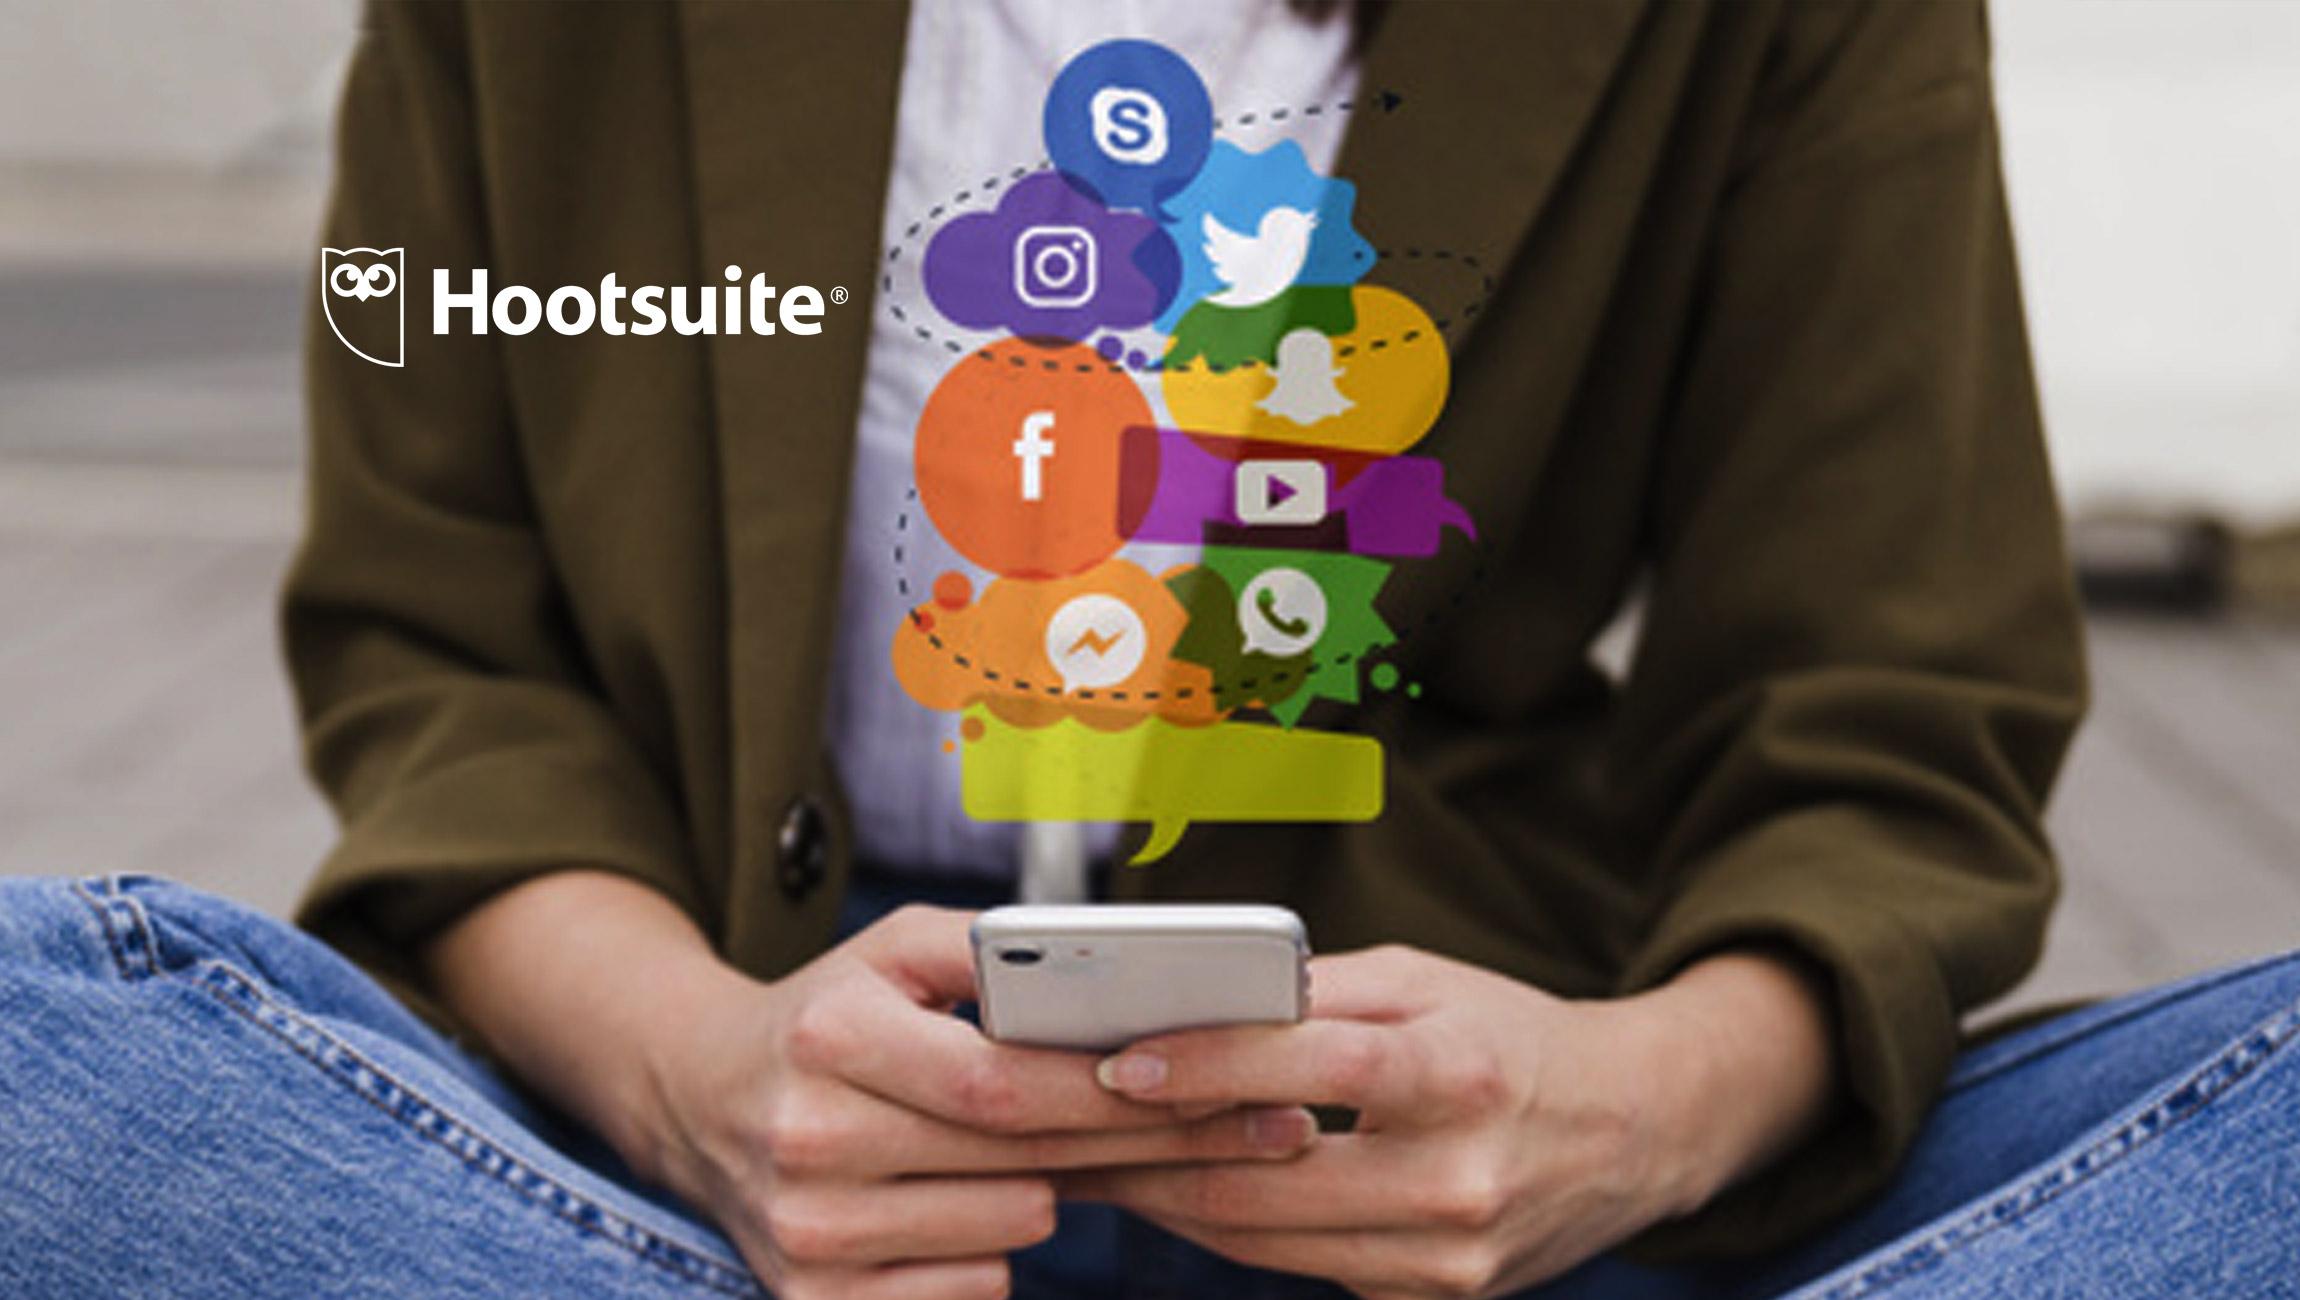 Hootsuite Expands LinkedIn Integration To Help Businesses Maximize Impact